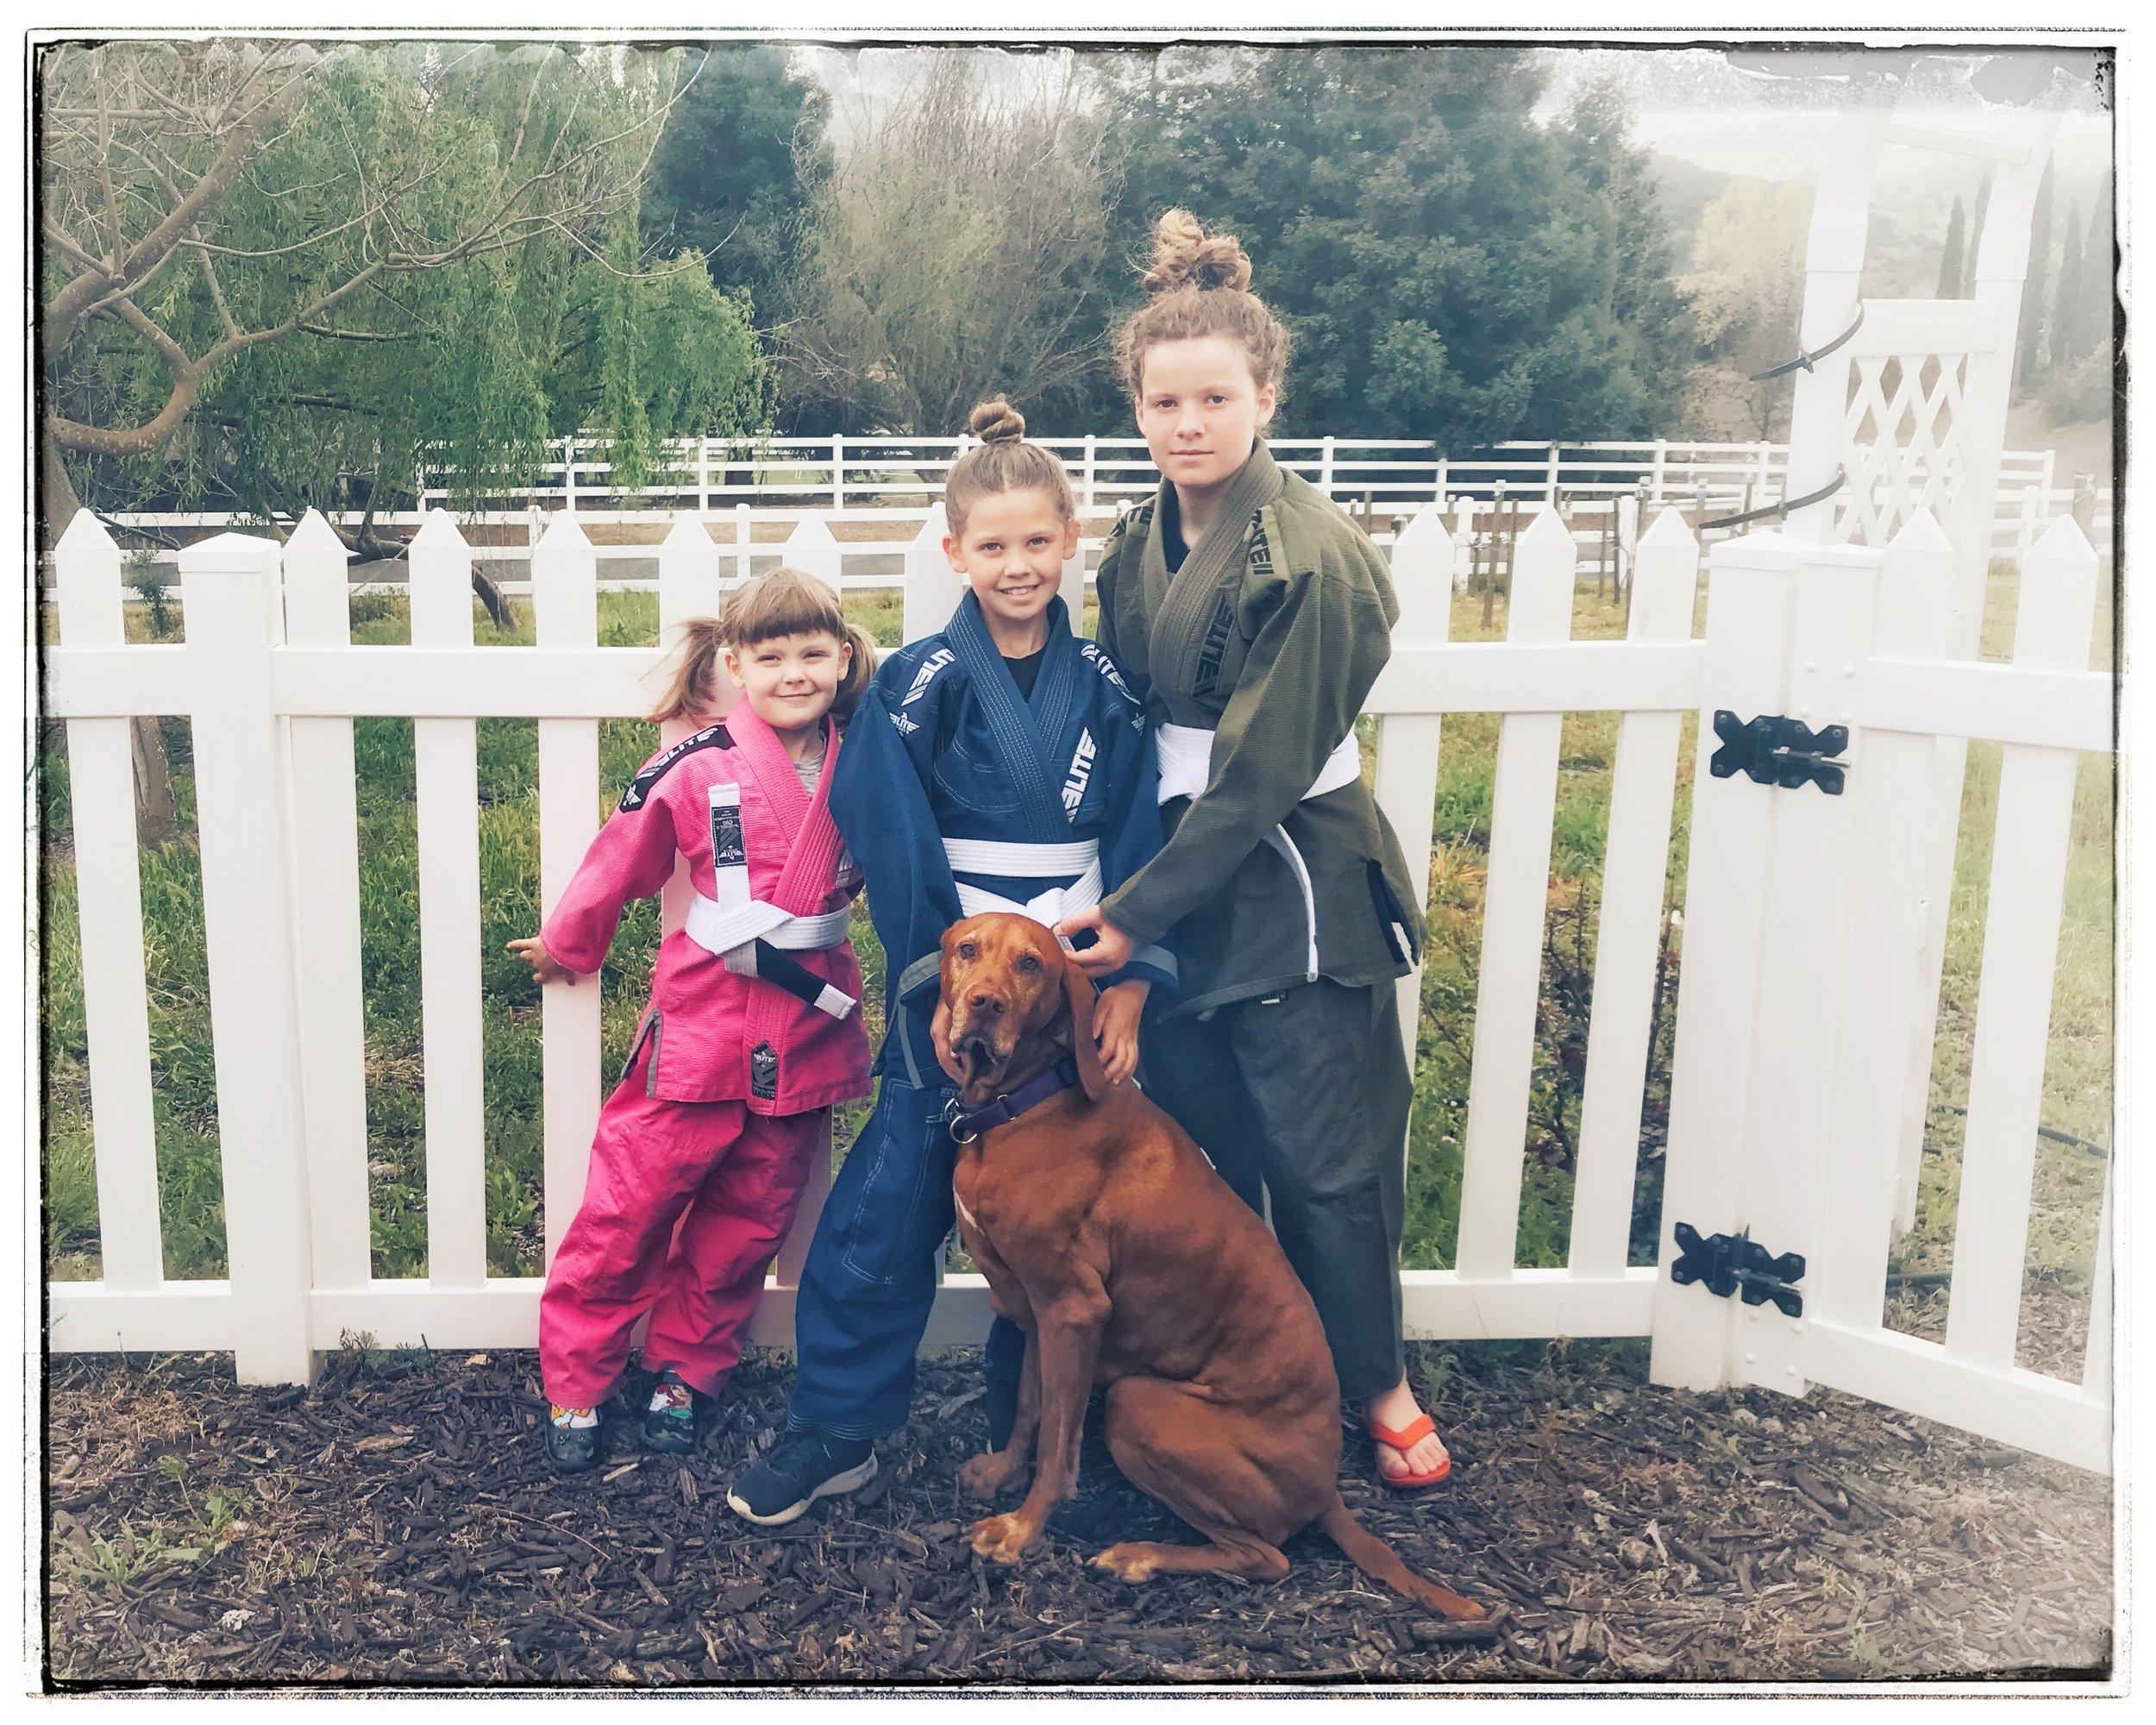 The lovely Schmitt girls with their dog, 'Tus (short for Volatus).